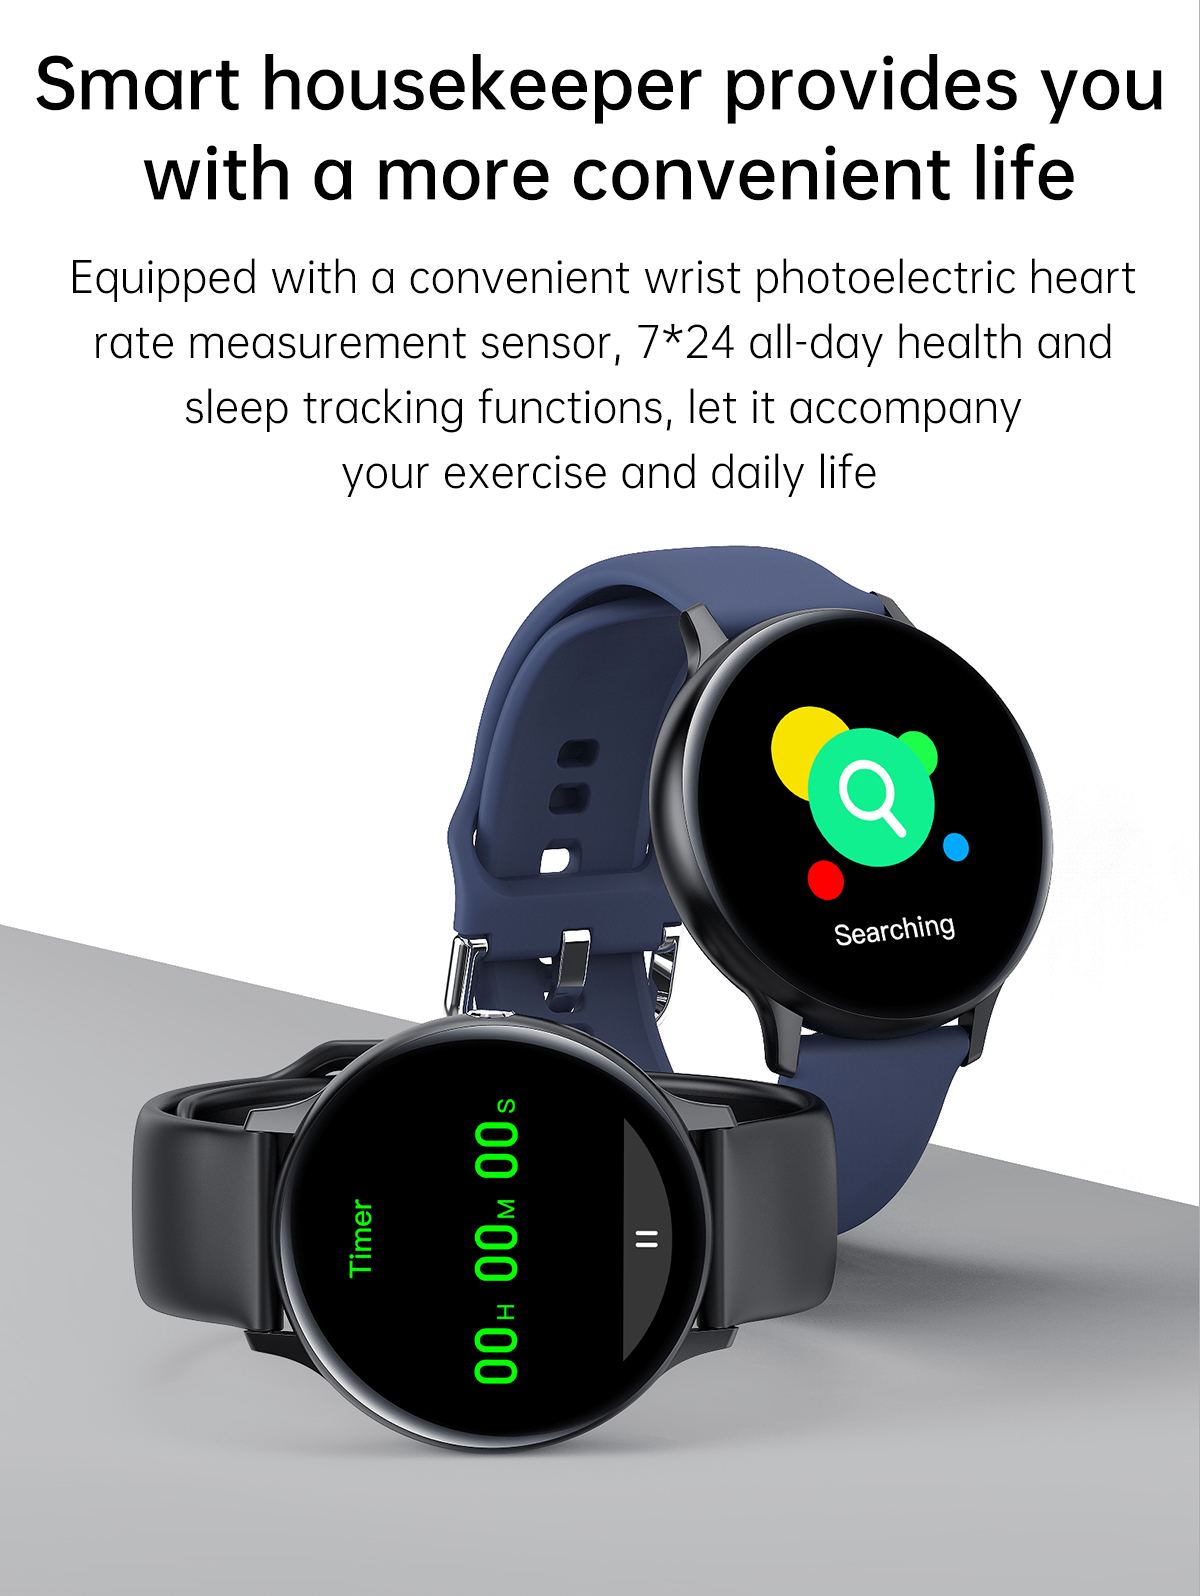 Hb32982a280b44453b87833446e2691eca LIGE 2021 New Bluetooth call smart watch men women Sport mode Heart rate and blood pressure monitor Activity tracker Smartwatch